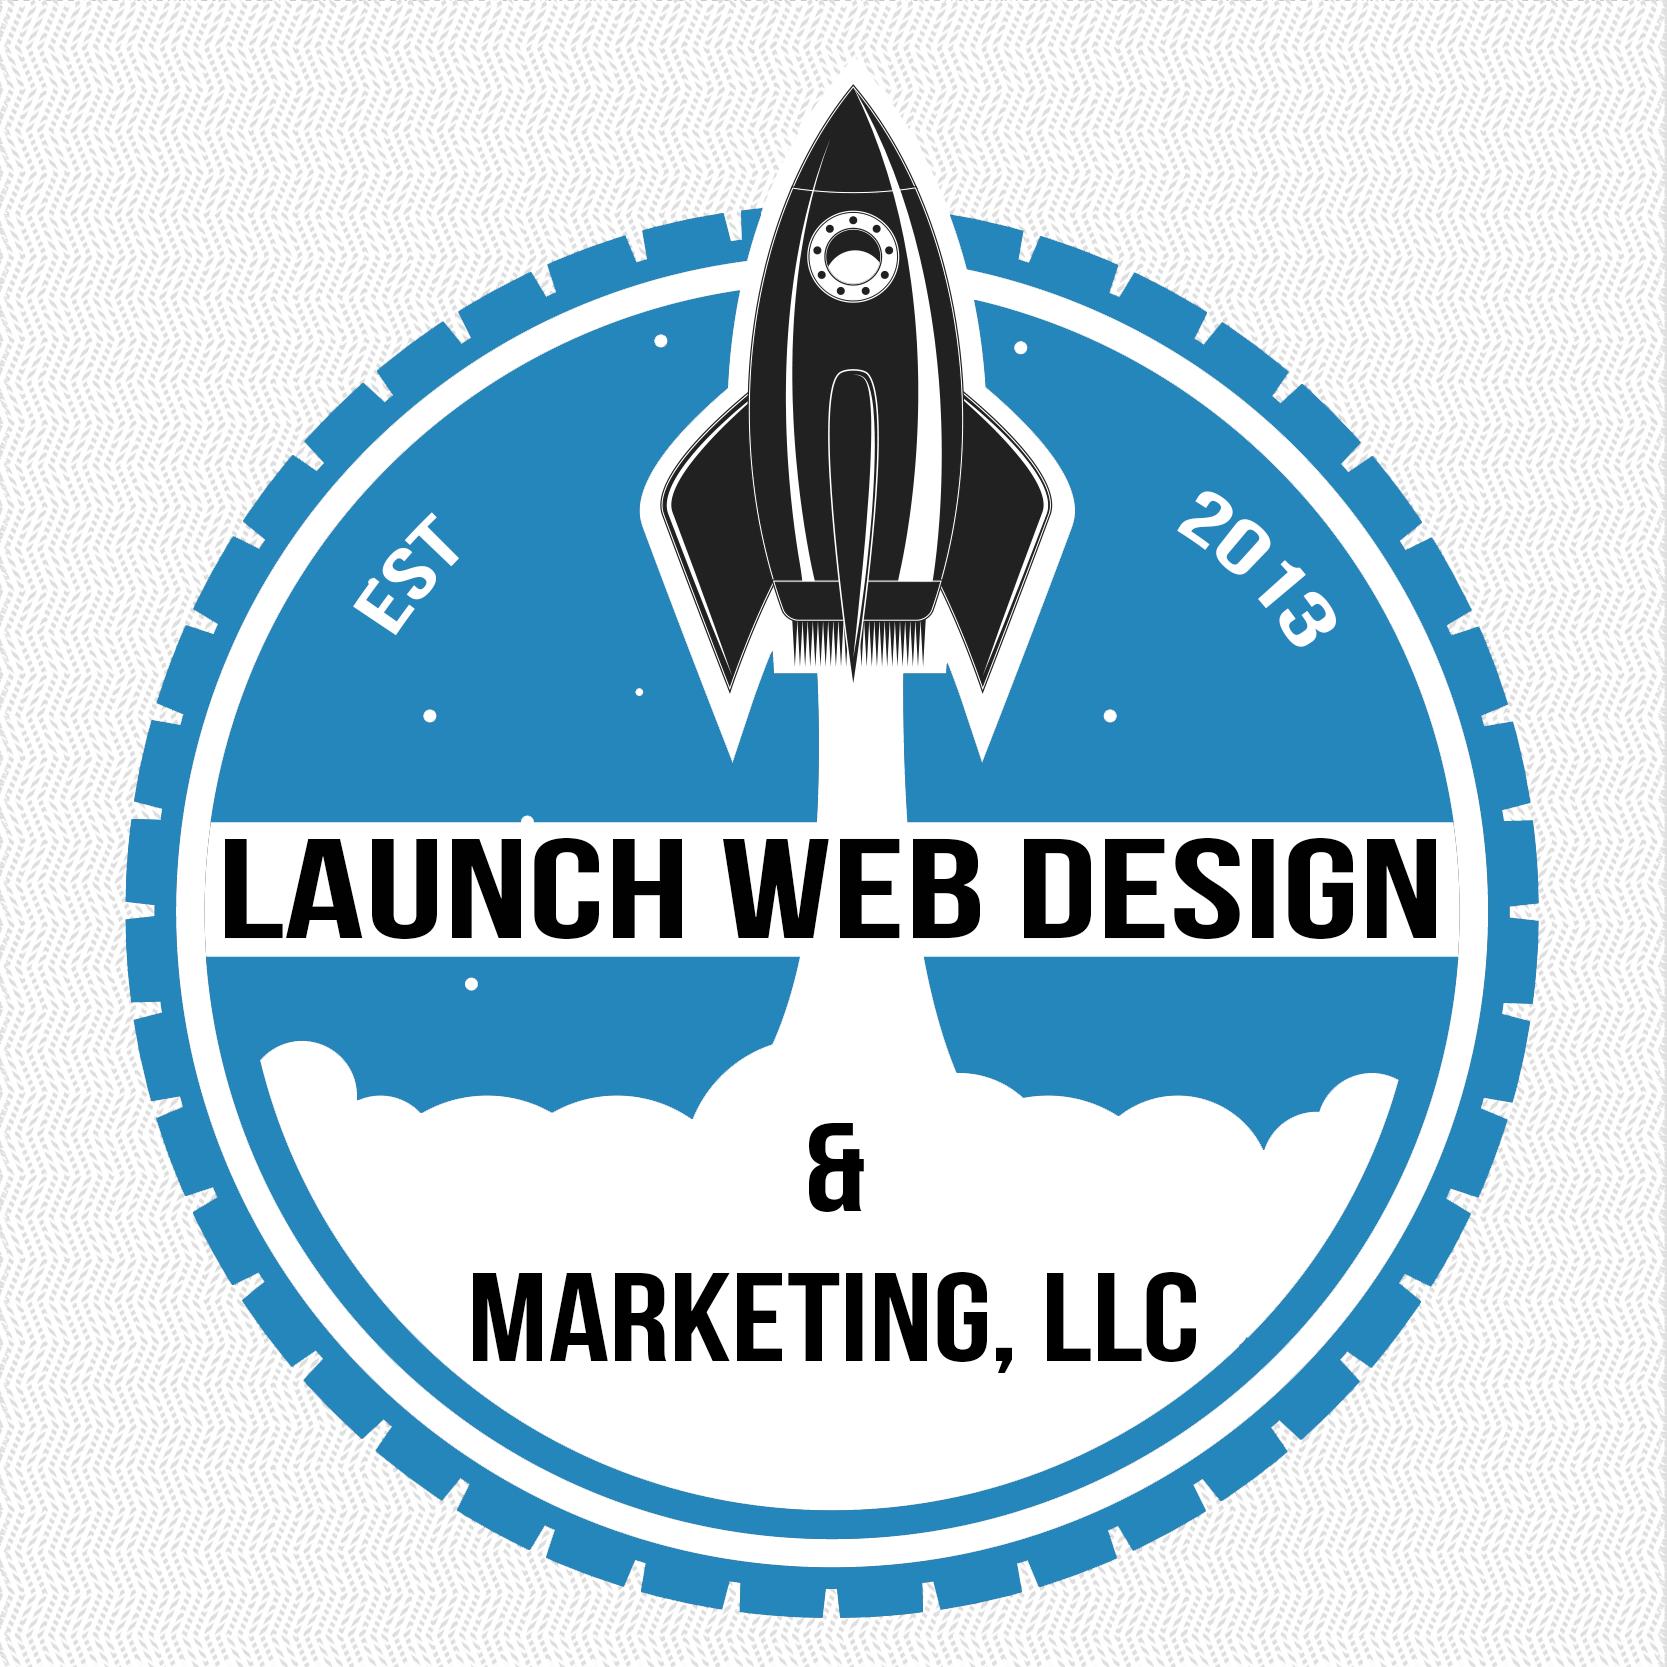 LAUNCH Web Design & Marketing